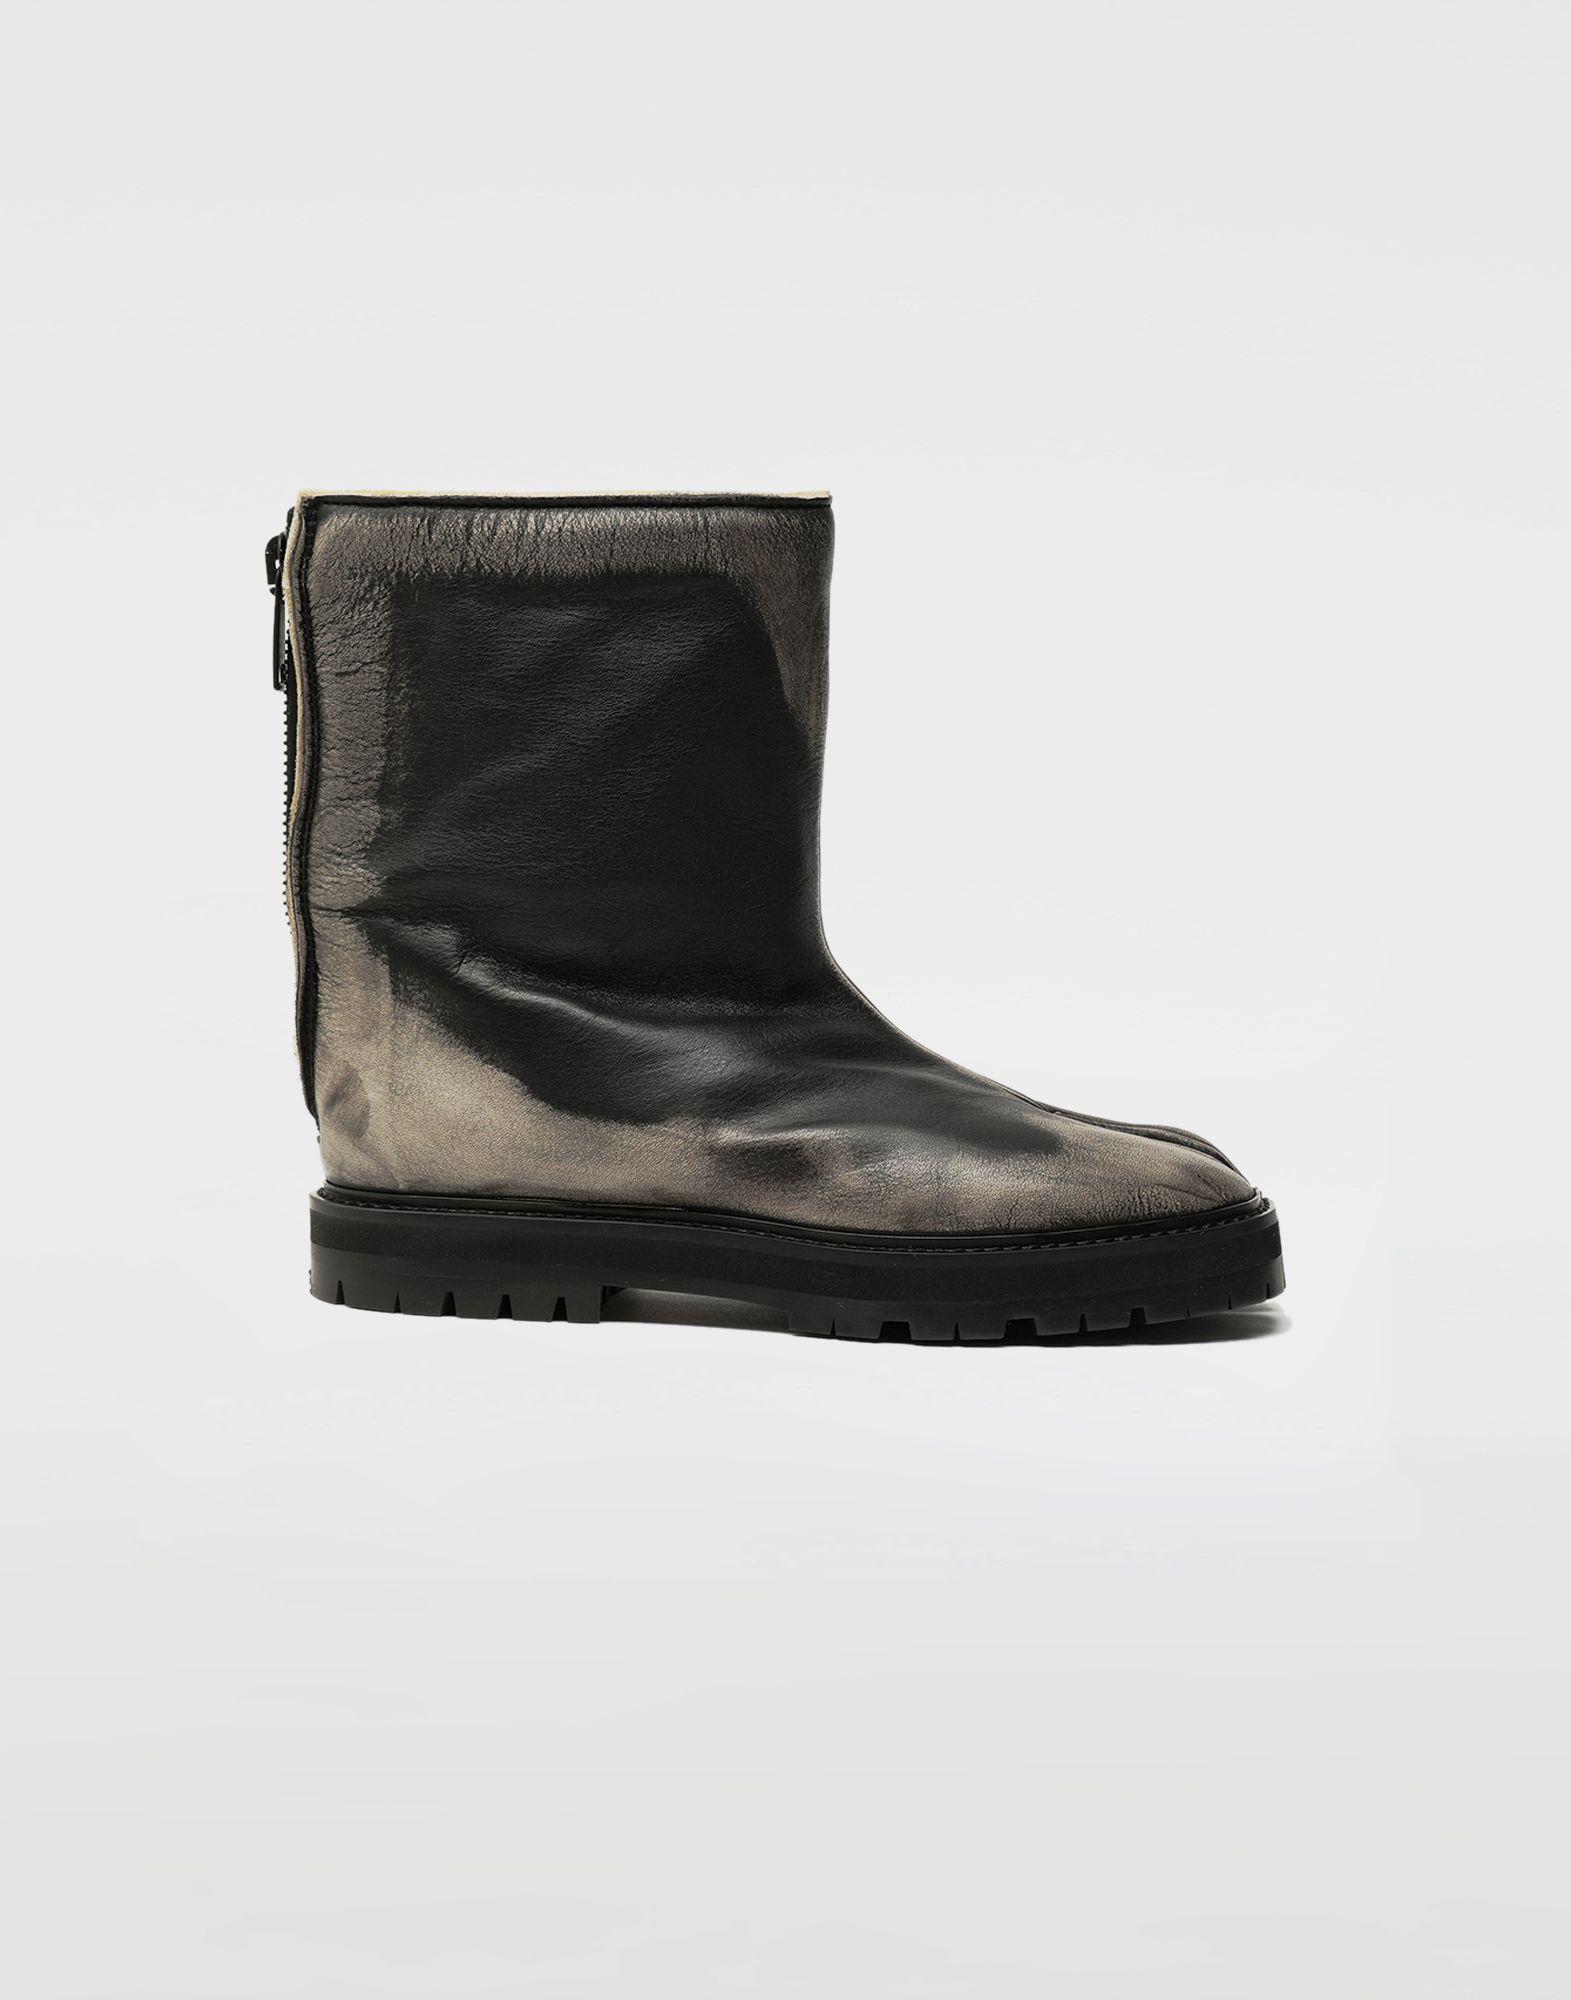 MAISON MARGIELA Tabi leather hunter boots Tabi boots Woman f